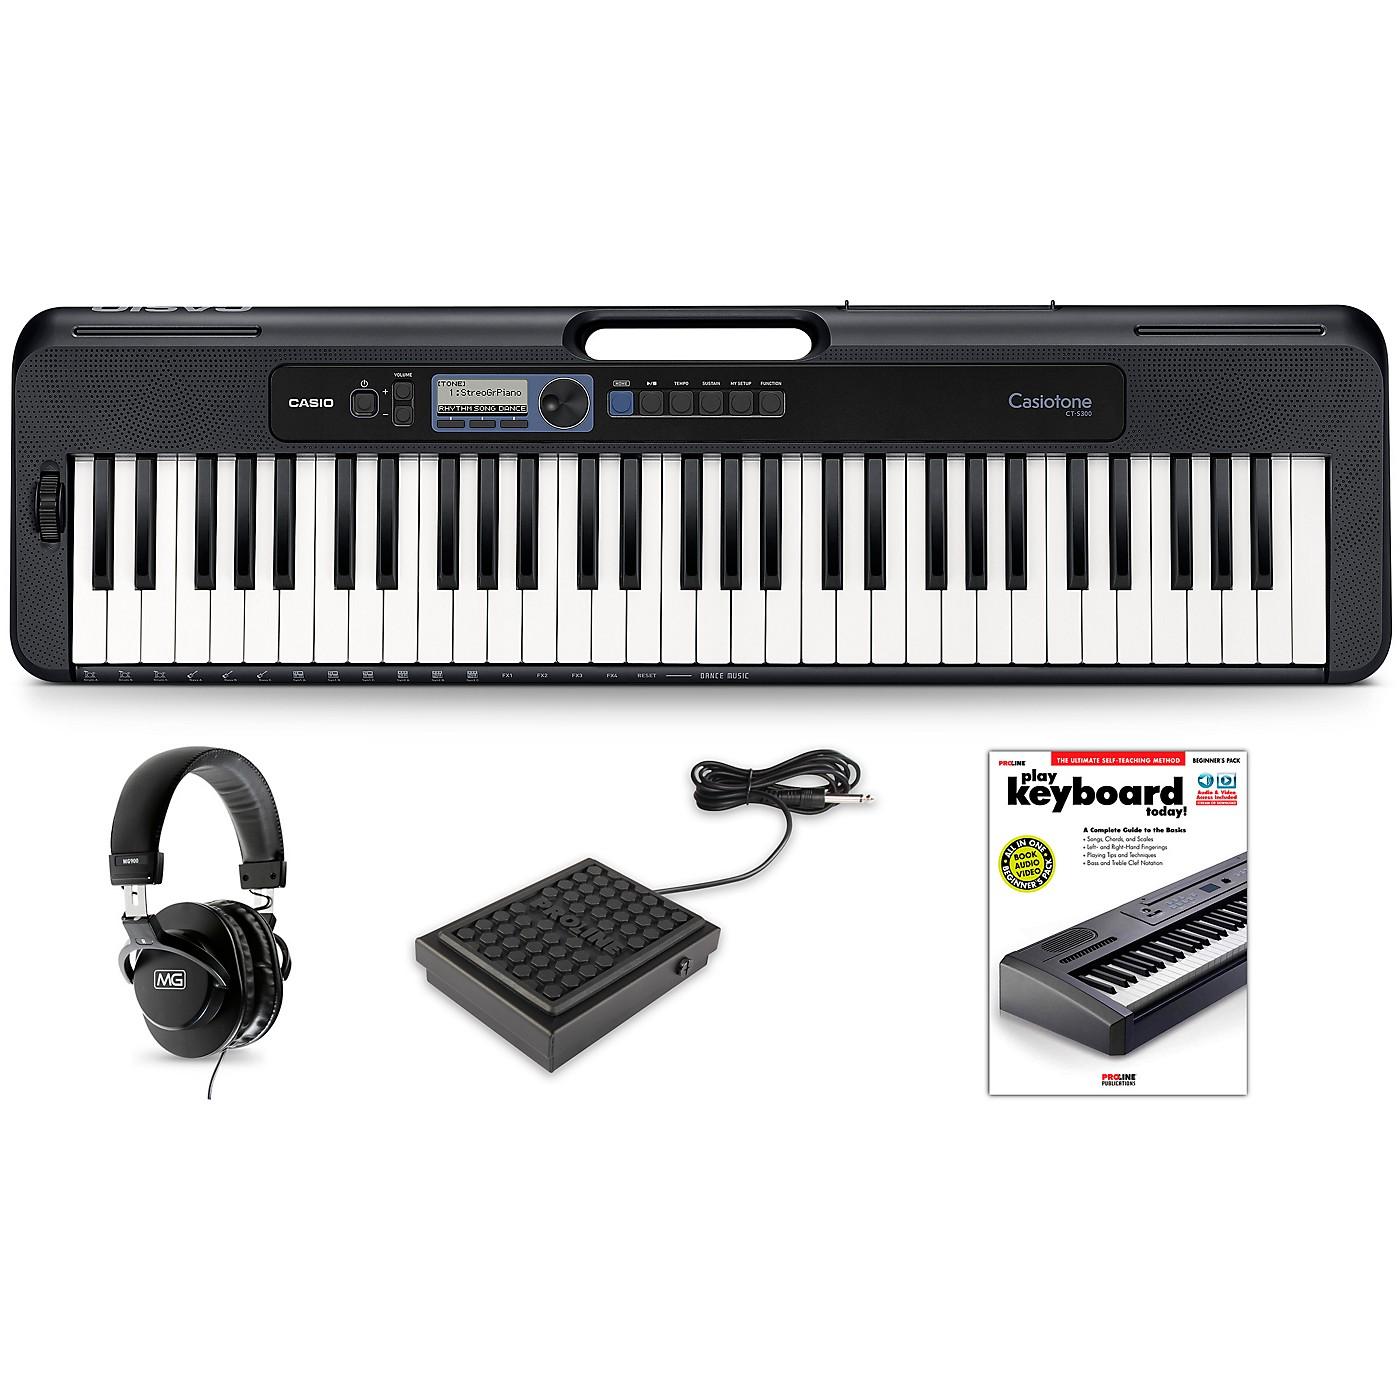 Casio Casiotone CT-S300 Keyboard Essentials Kit thumbnail